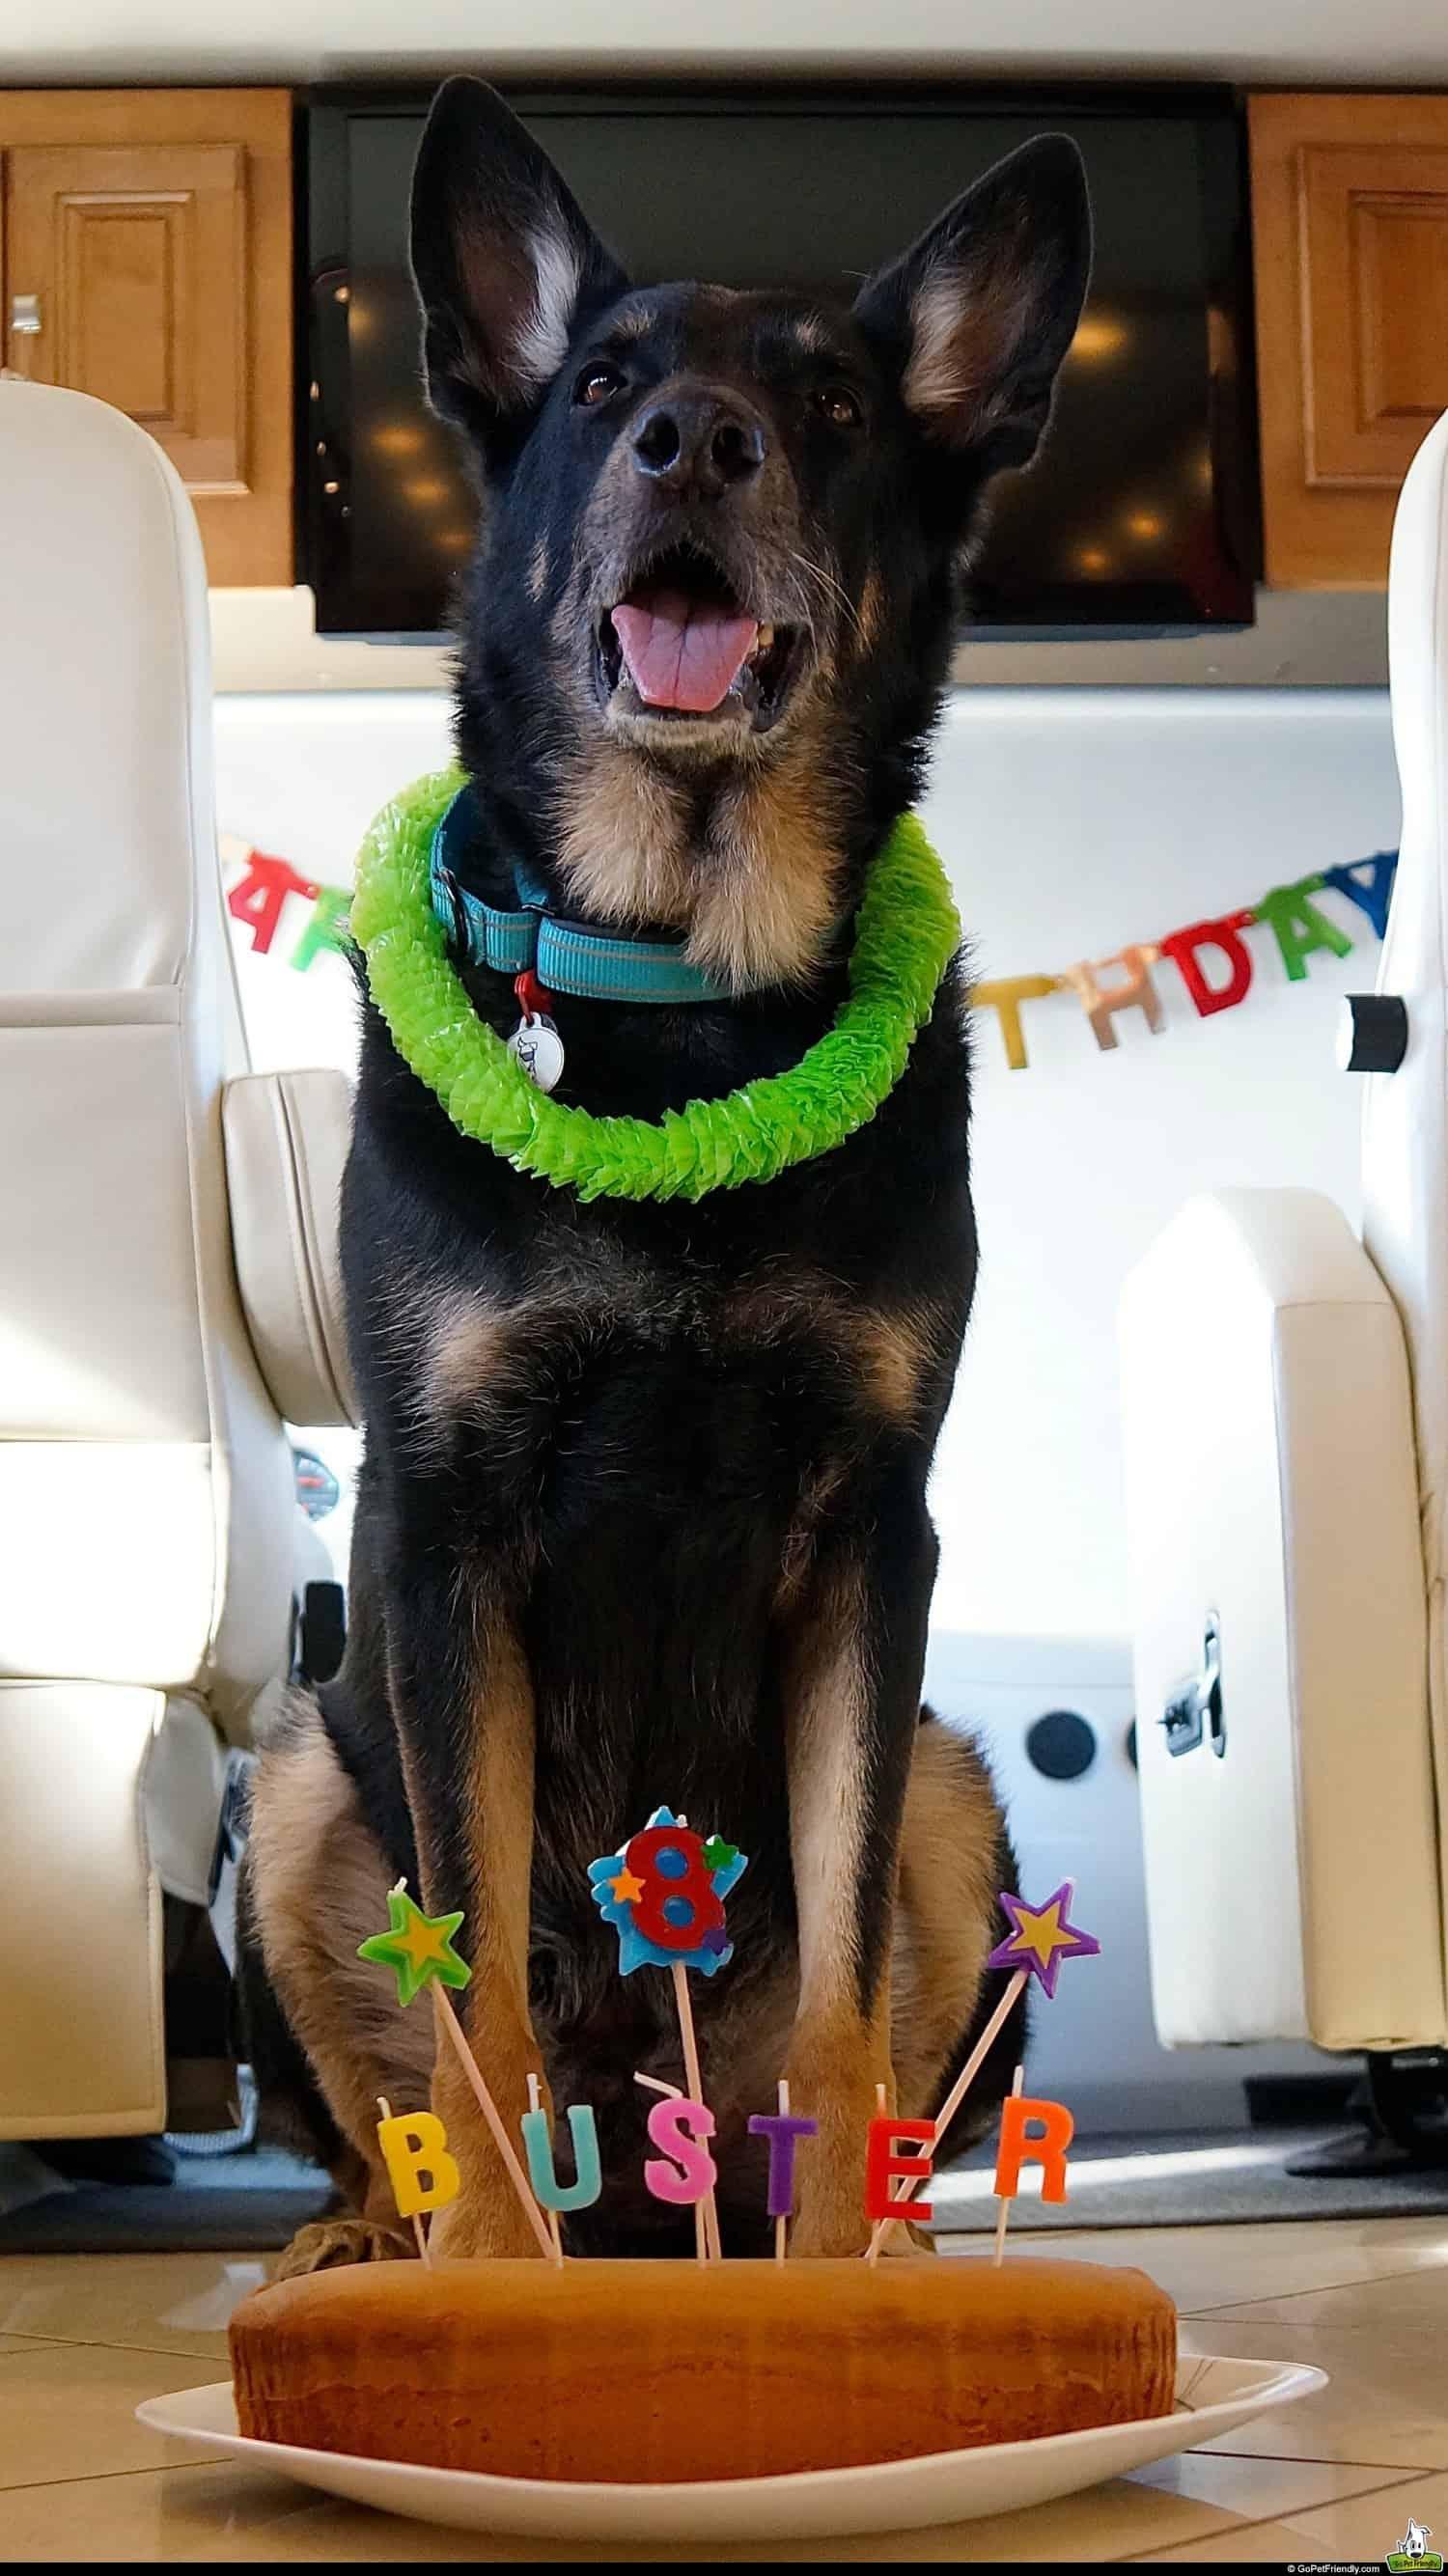 Buster's Birthday - Santa Fe, NM